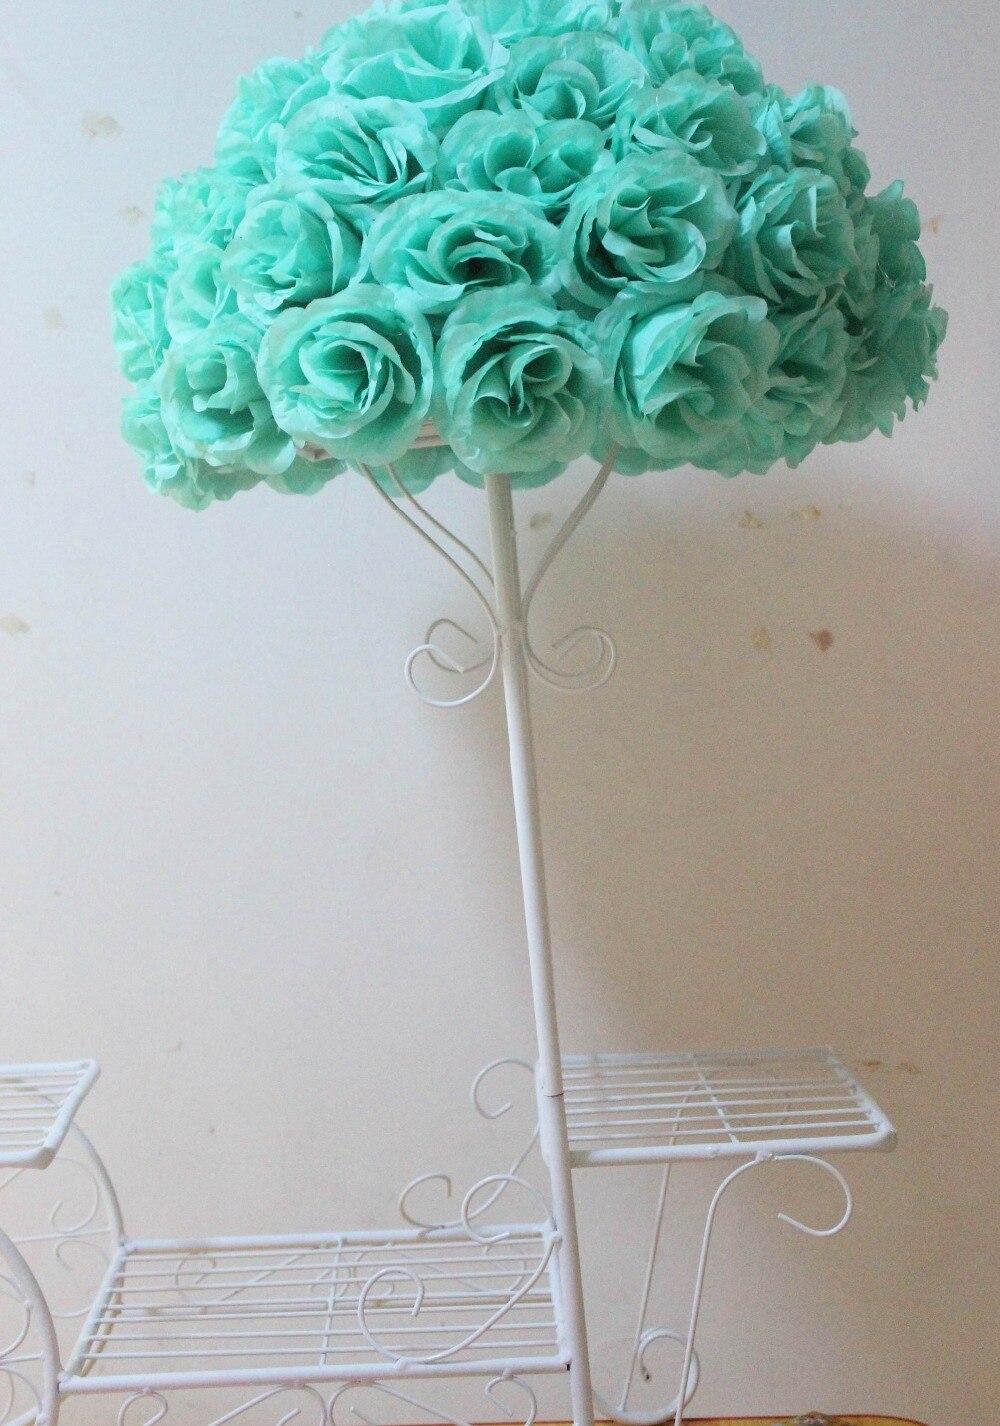 23cm15 Pcslot Rose Kissing Ball Artificial Silk Flower Wedding